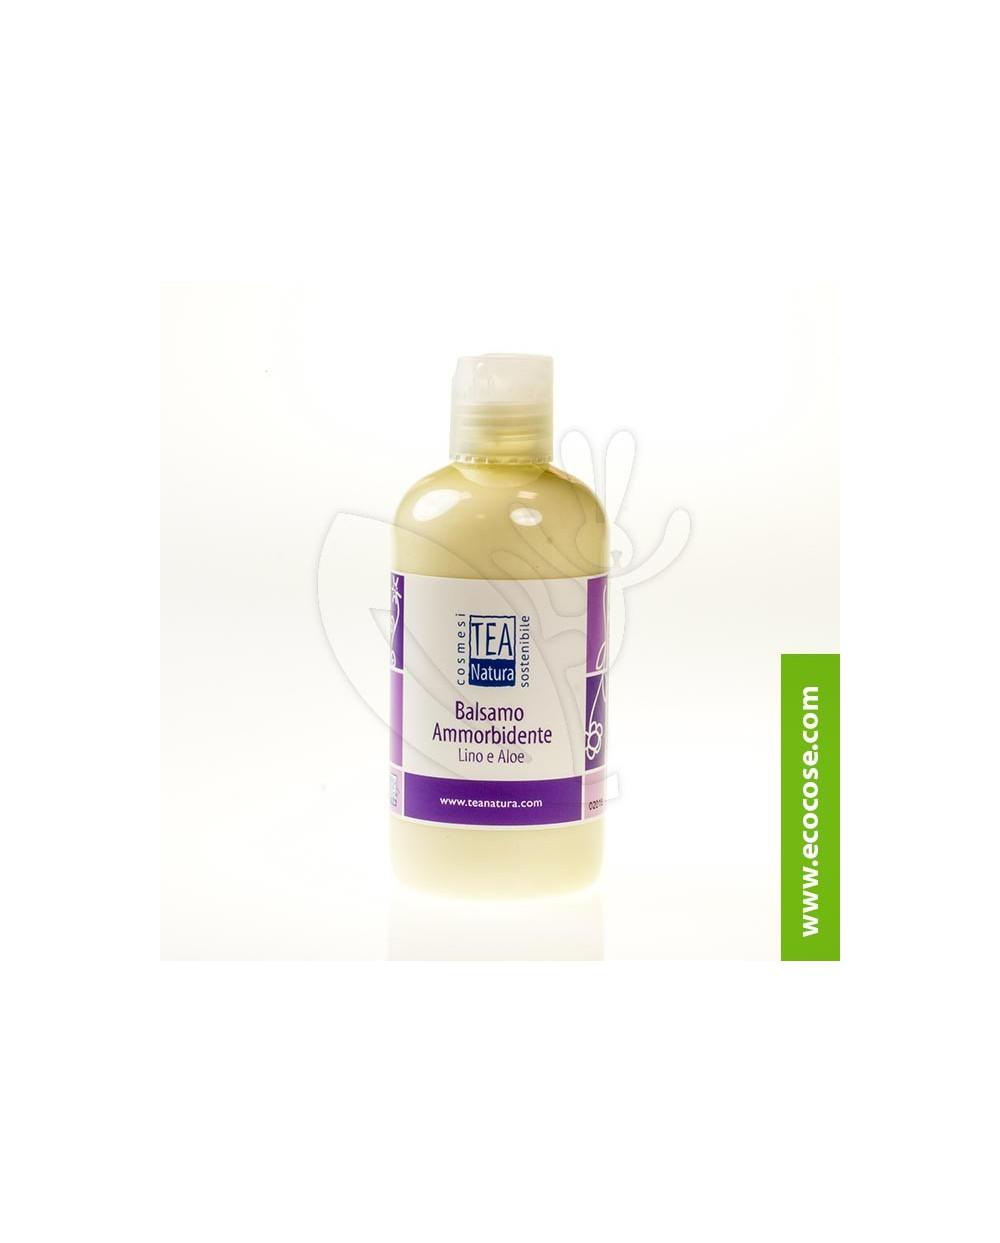 Tea Natura - Balsamo ammorbidente al Lino e Aloe